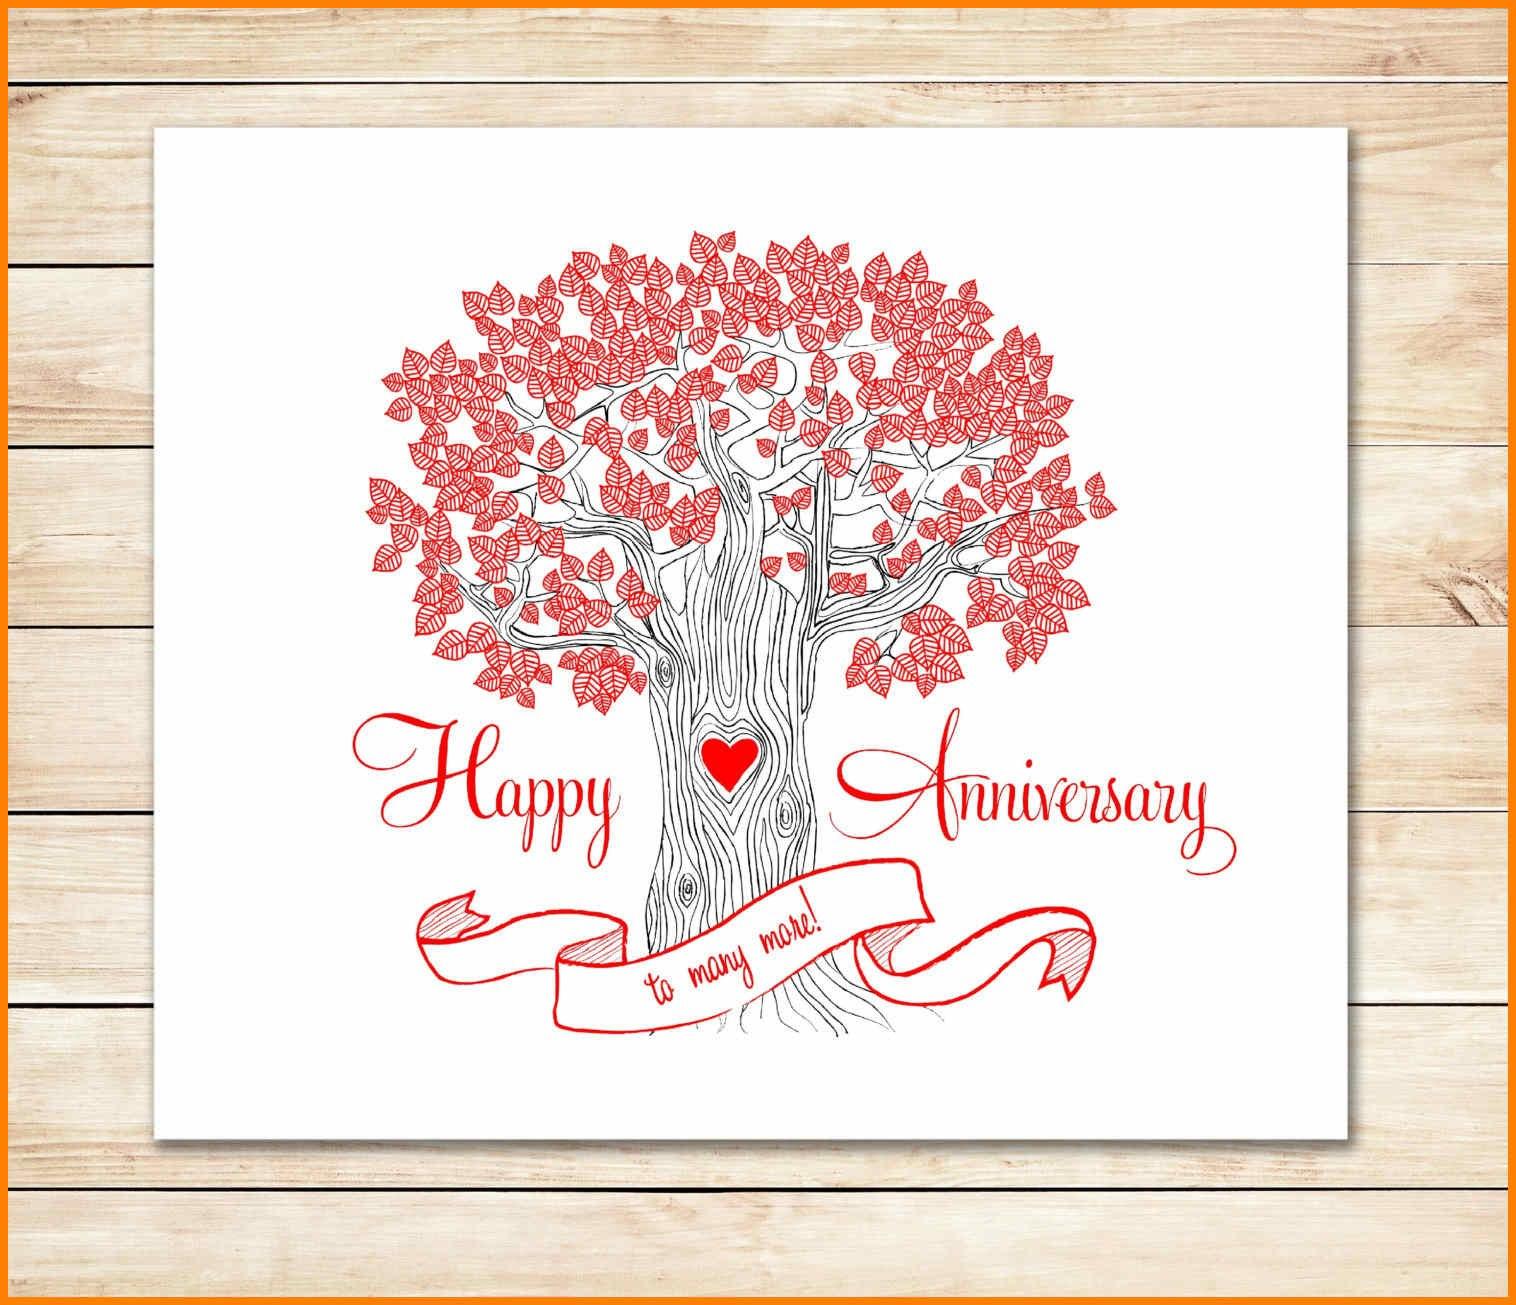 Happy Anniversary Templates Free  Plasticmouldings Regarding Word Anniversary Card Template